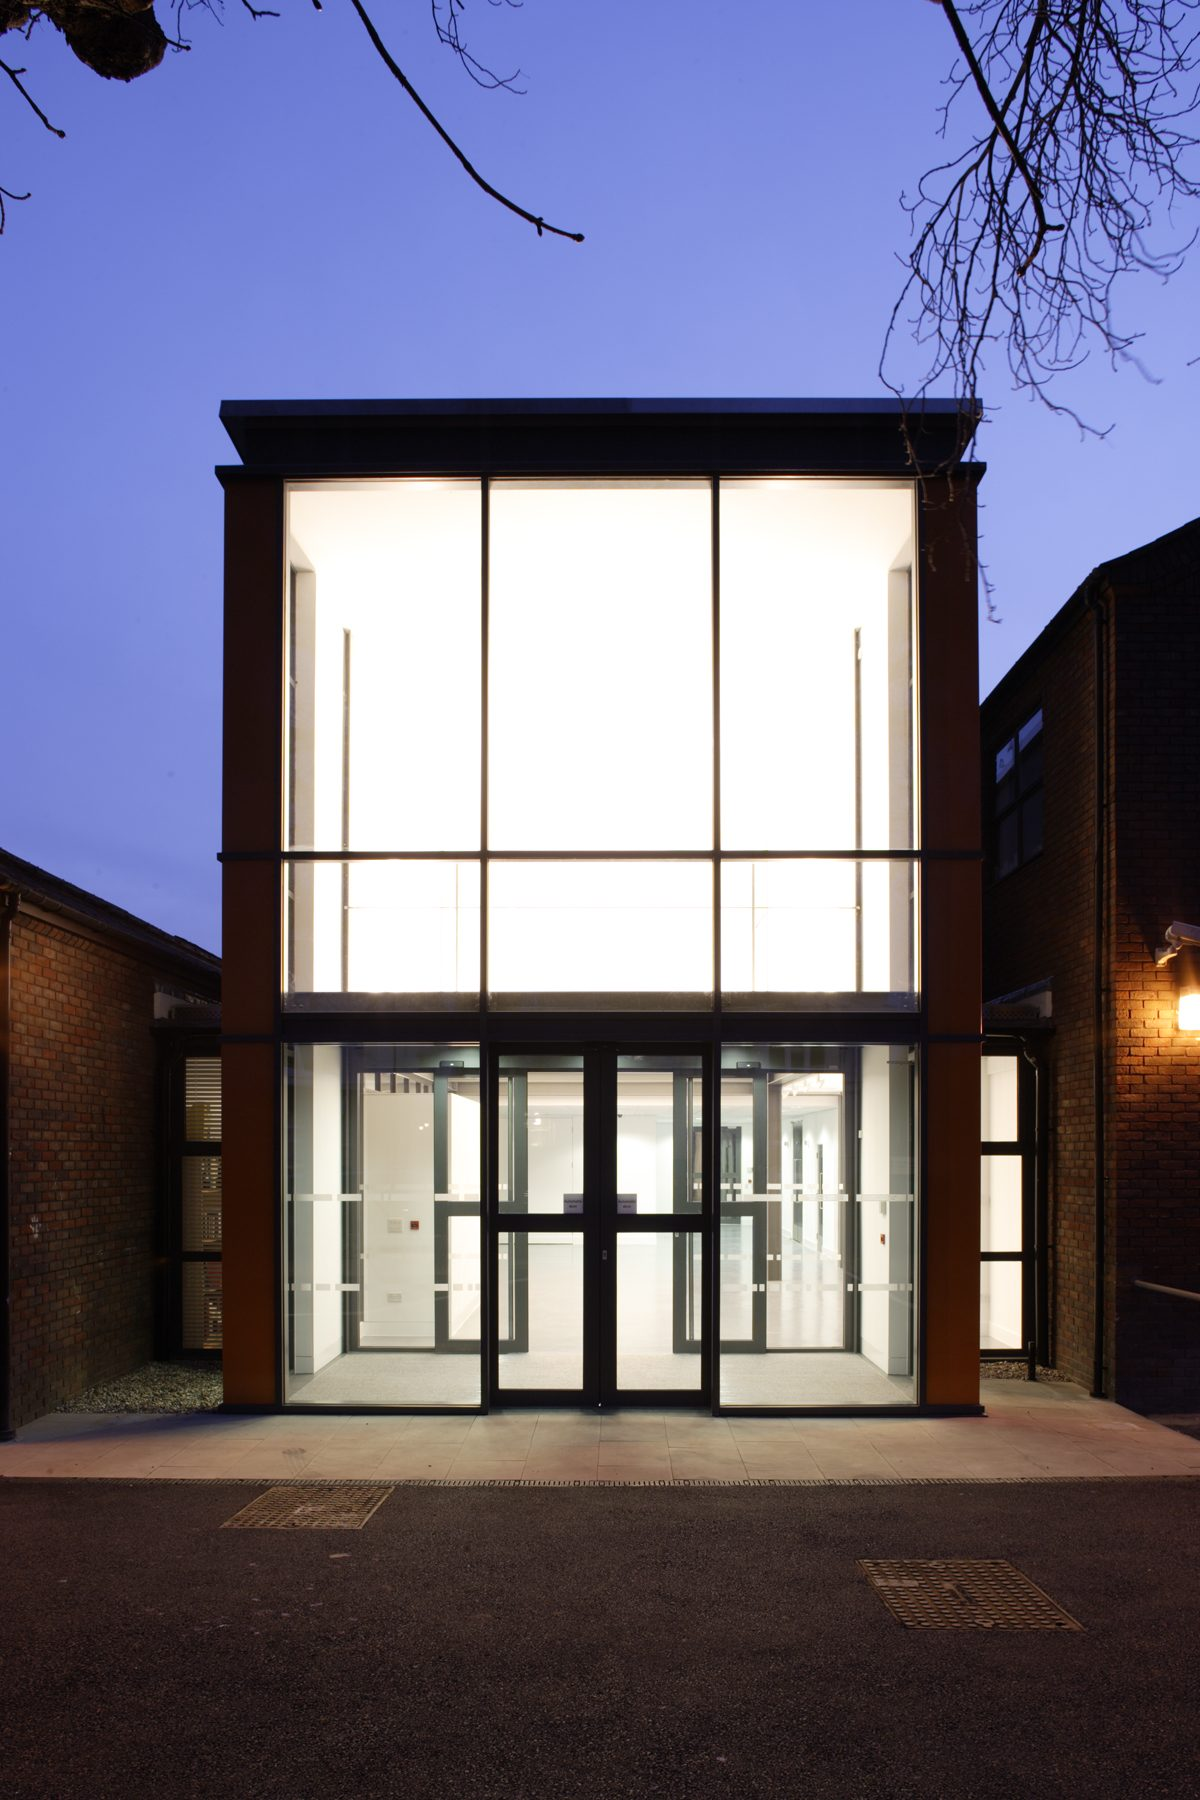 Wimbledon College of Art - Foyer - Exterior by night